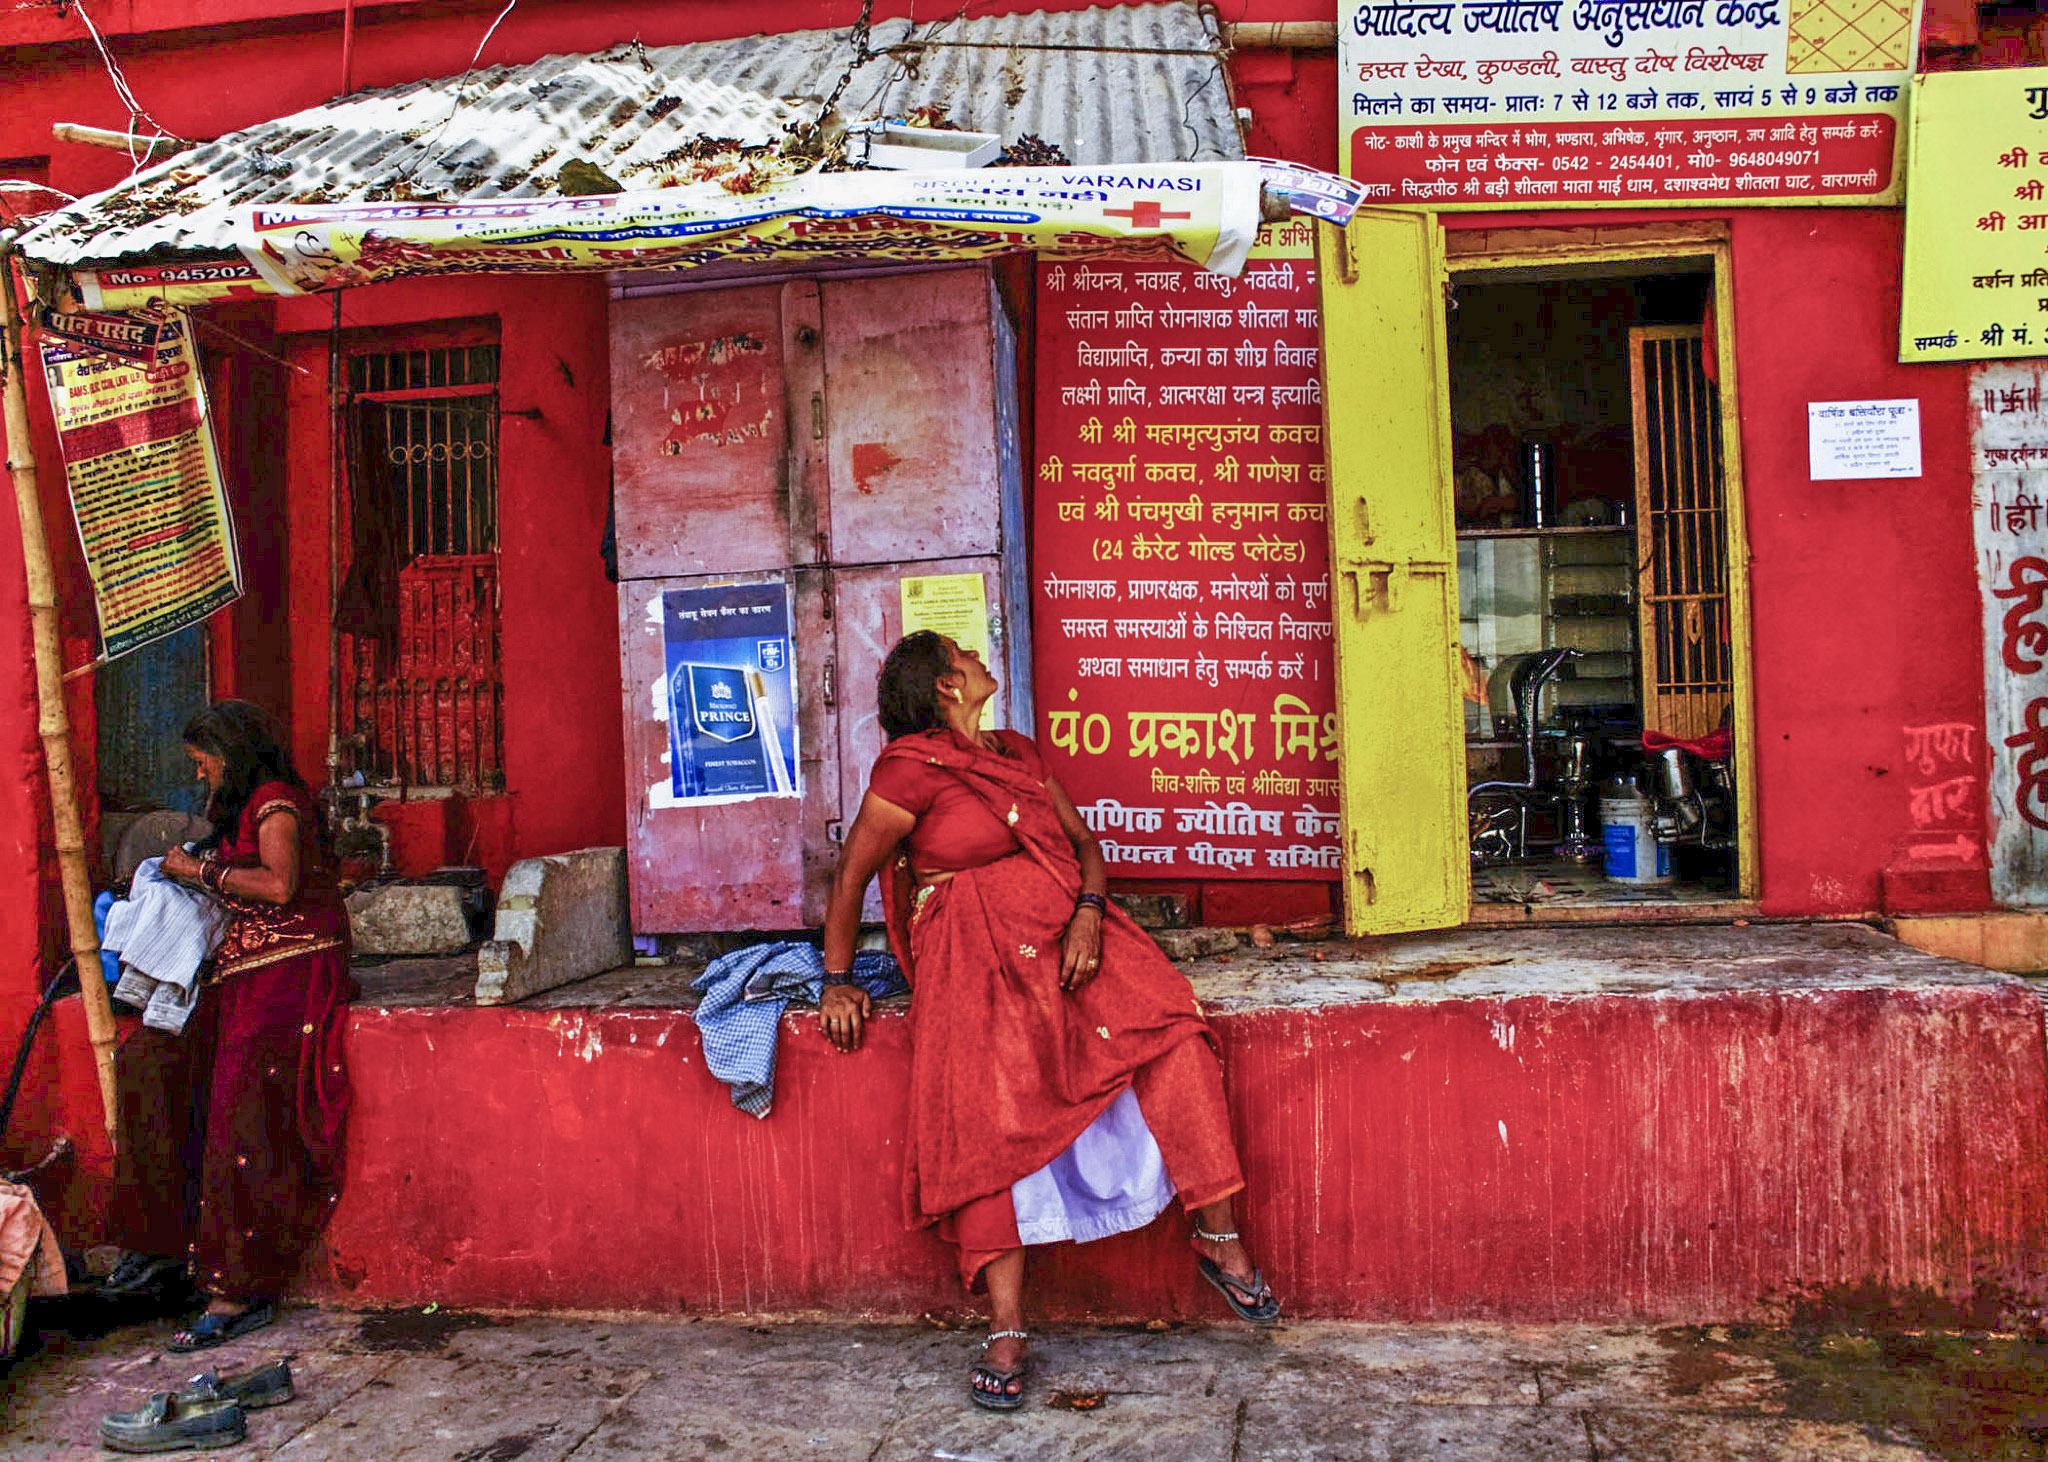 Varanasi vendor (India)